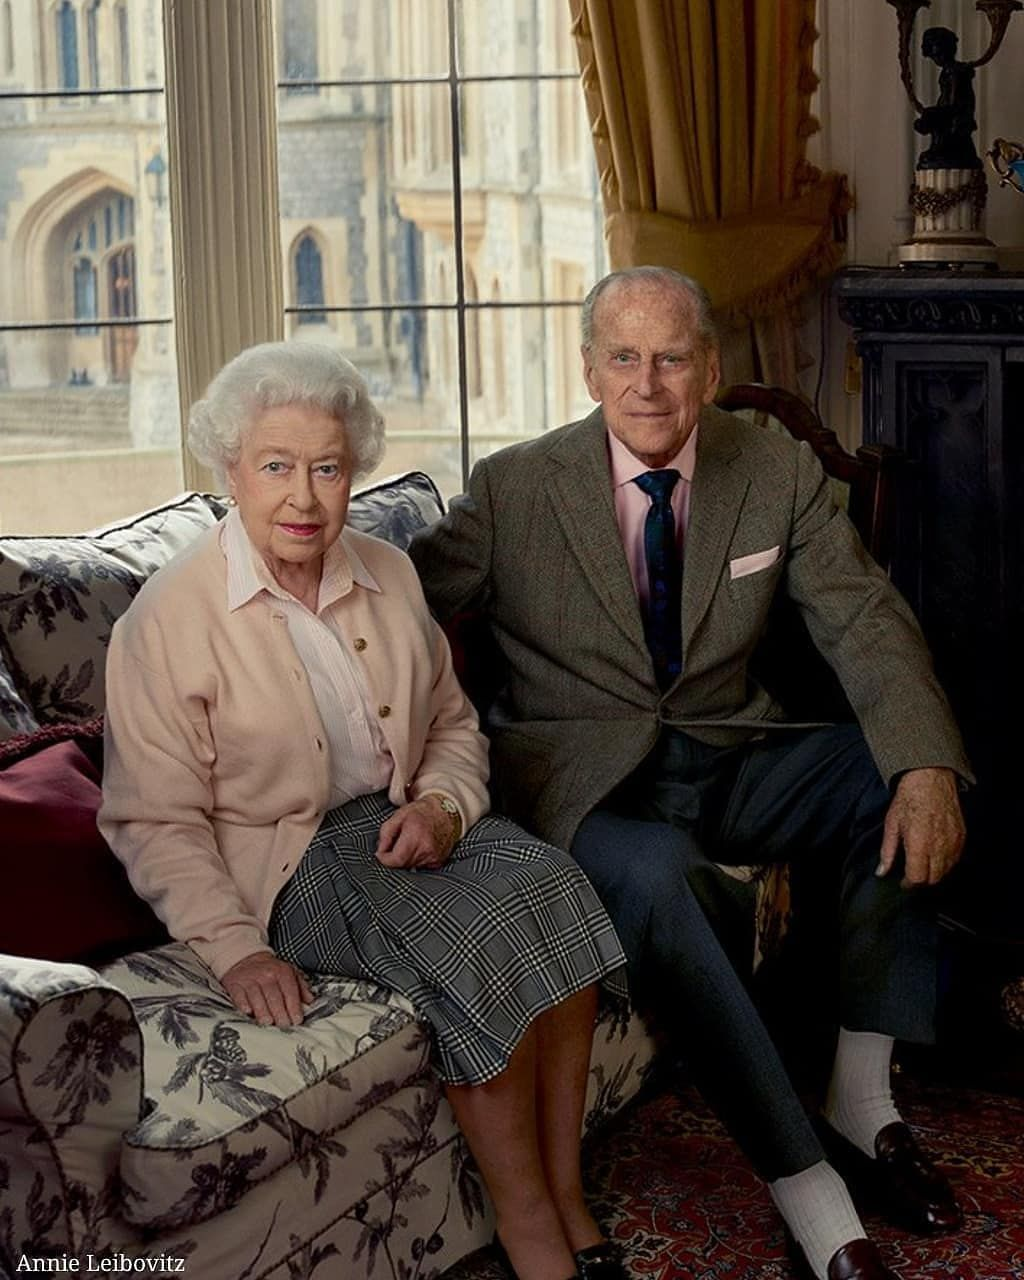 19 2 K Mentions J Aime 1 034 Commentaires Queen Elizabeth Ii Fan Page Hm Queenelizabeth Sur Instagr In 2021 Her Majesty The Queen Prince Philip Queen Elizabeth